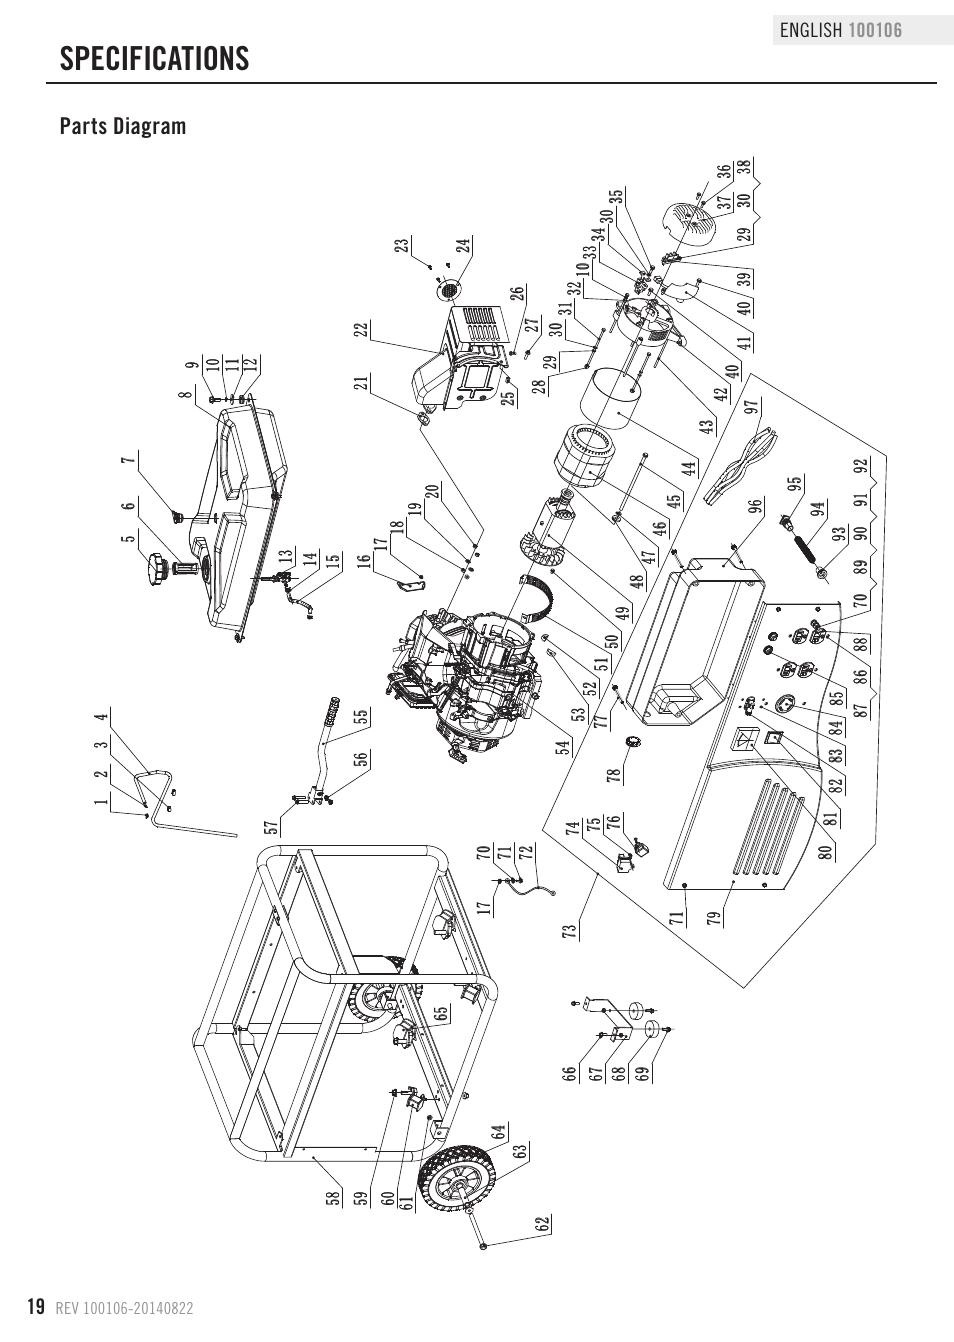 Specifications  Parts Diagram